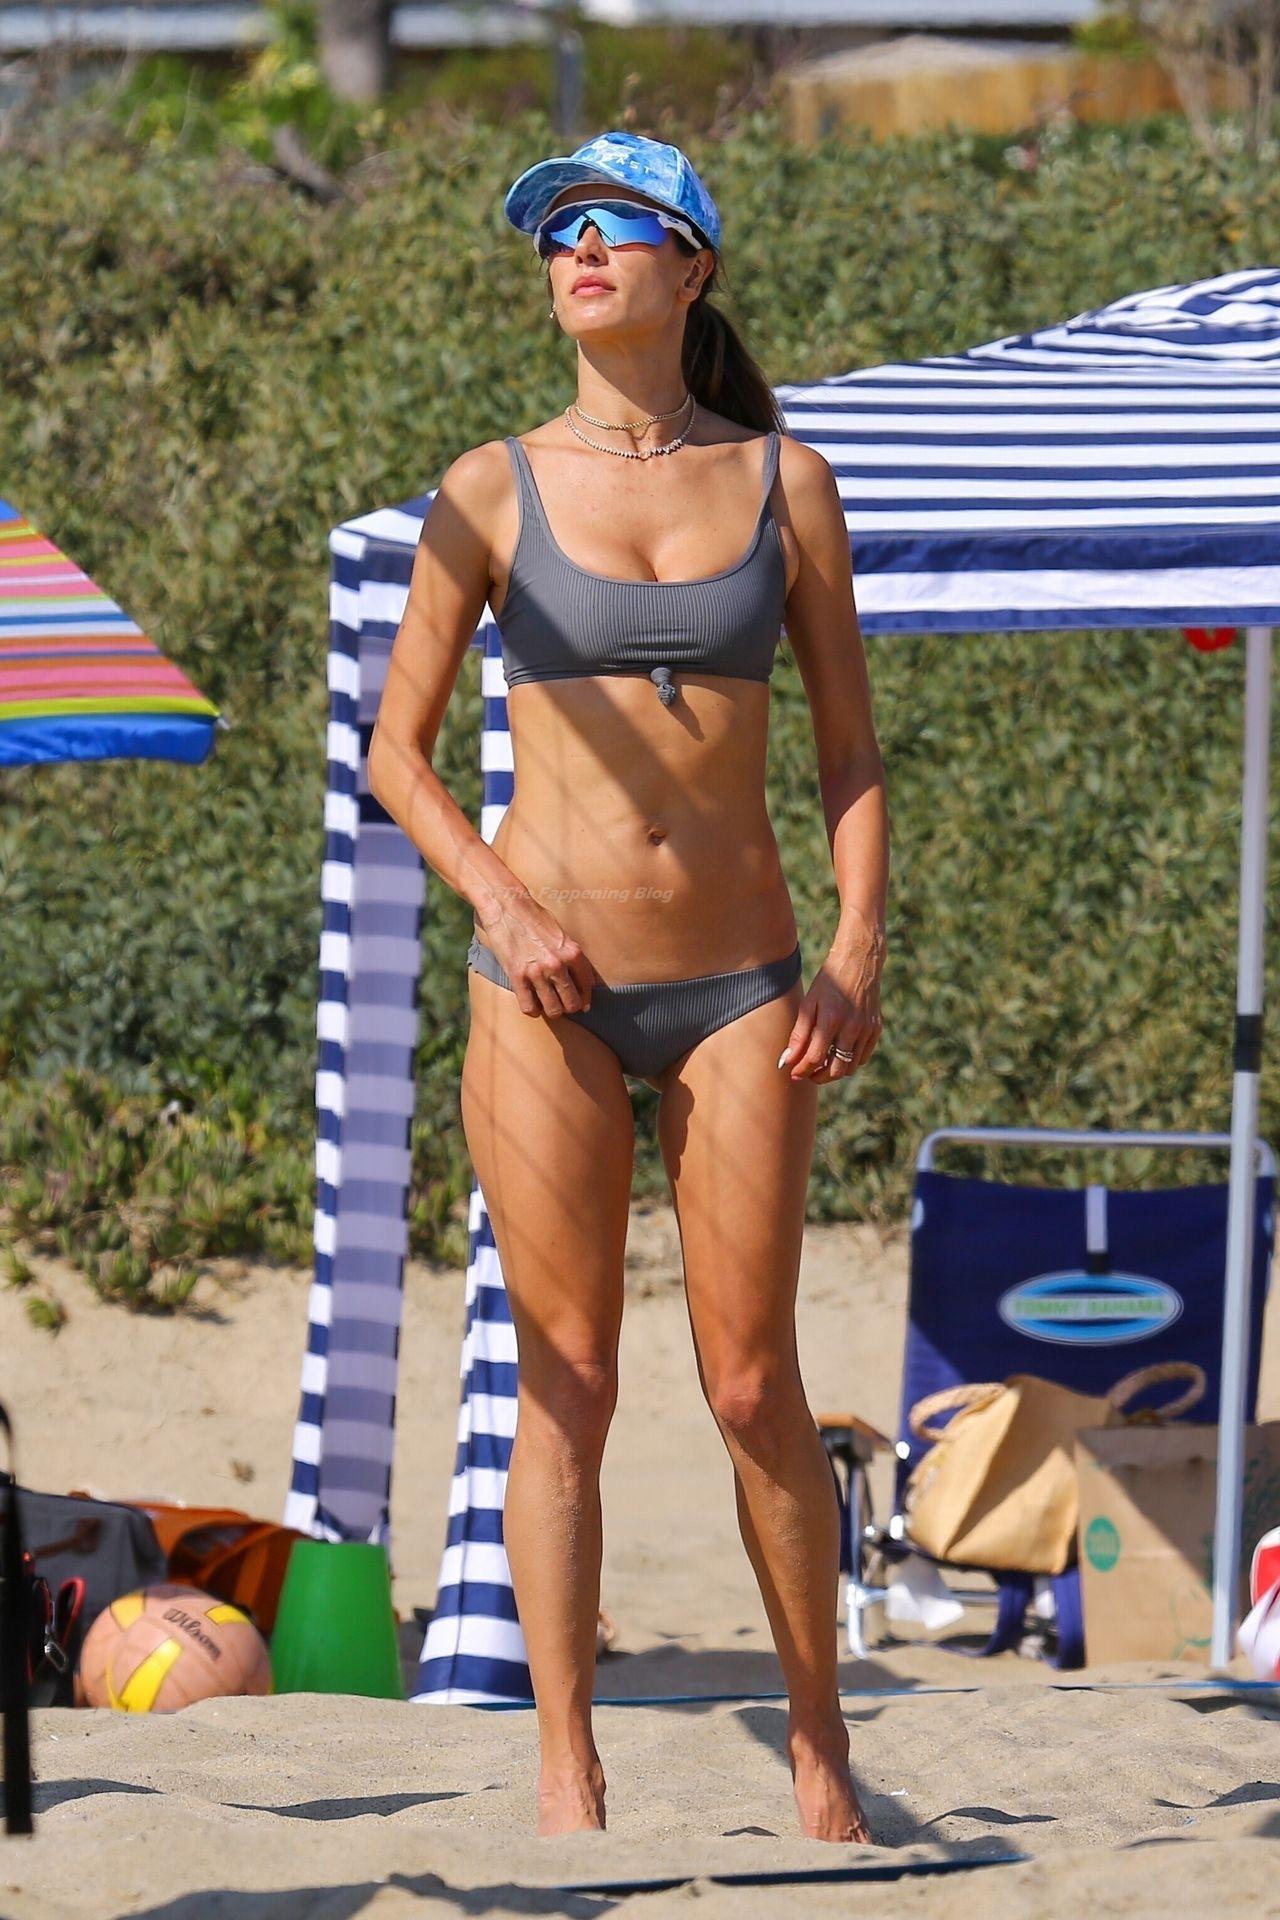 Alessandra-Ambrosio-Sexy-The-Fappening-Blog-21-3.jpg